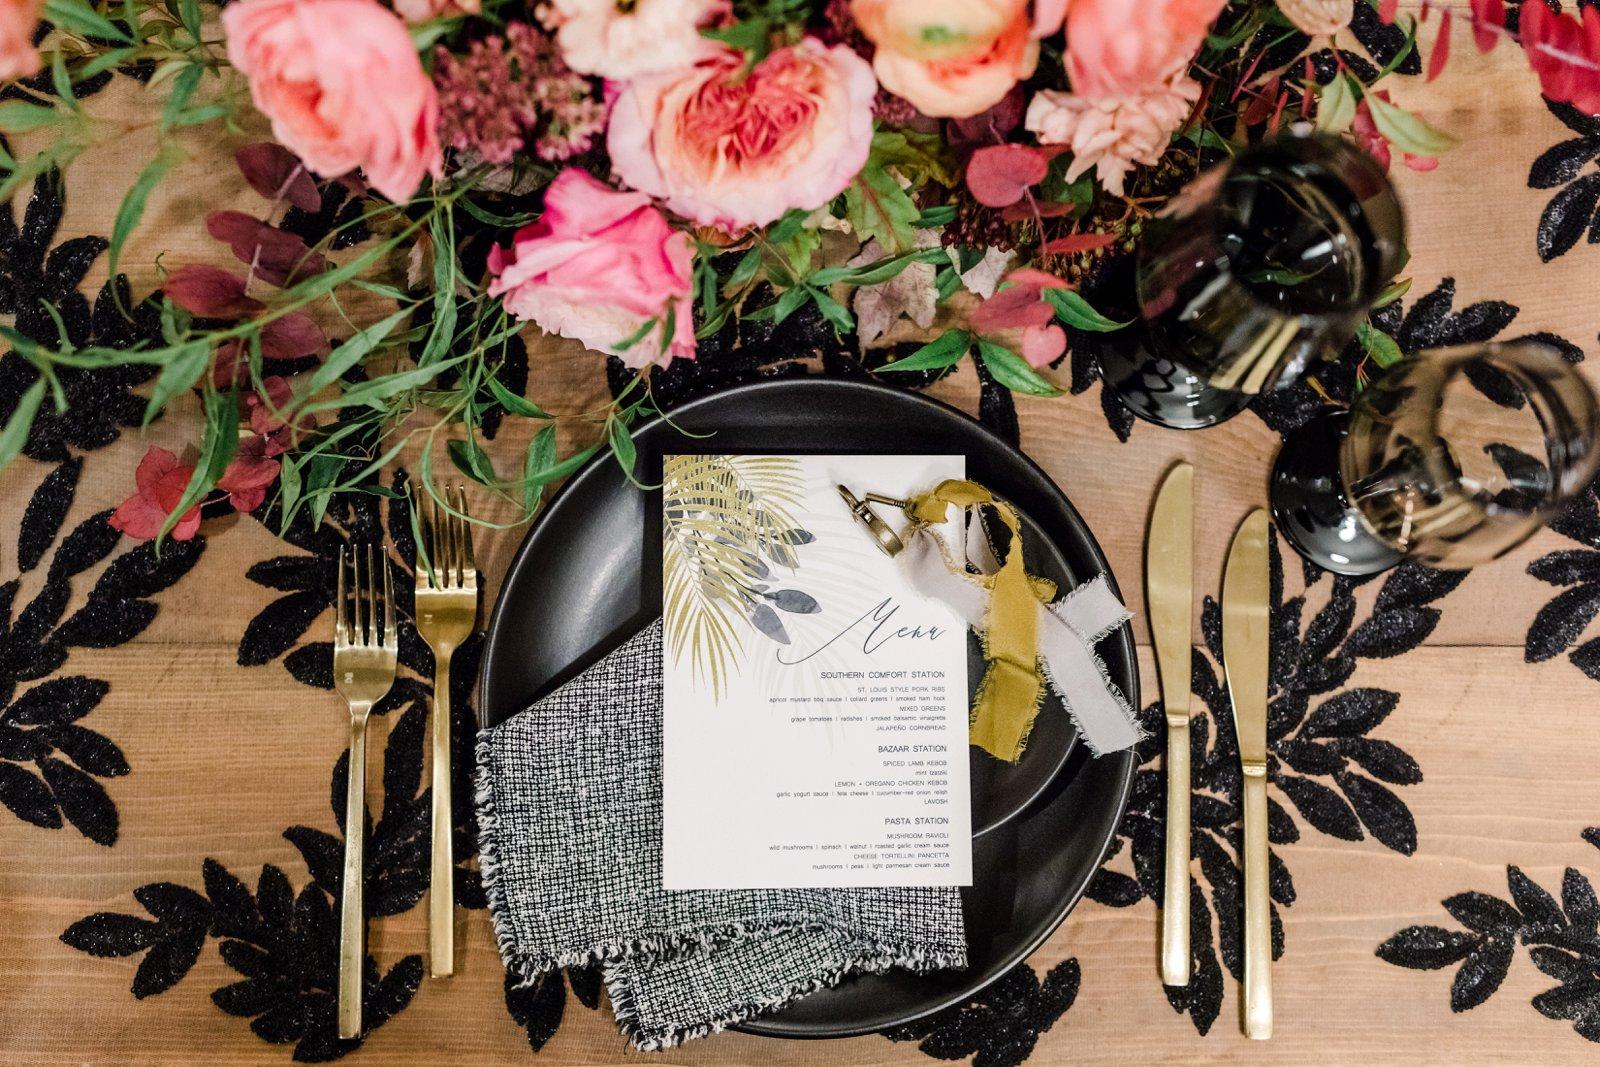 www.santabarbarawedding.com | Anna Delores Photography | Kimpton Canary Hotel | Onyx + Redwood | Elan Event Rentals | La Tavola Linen | Place Settings